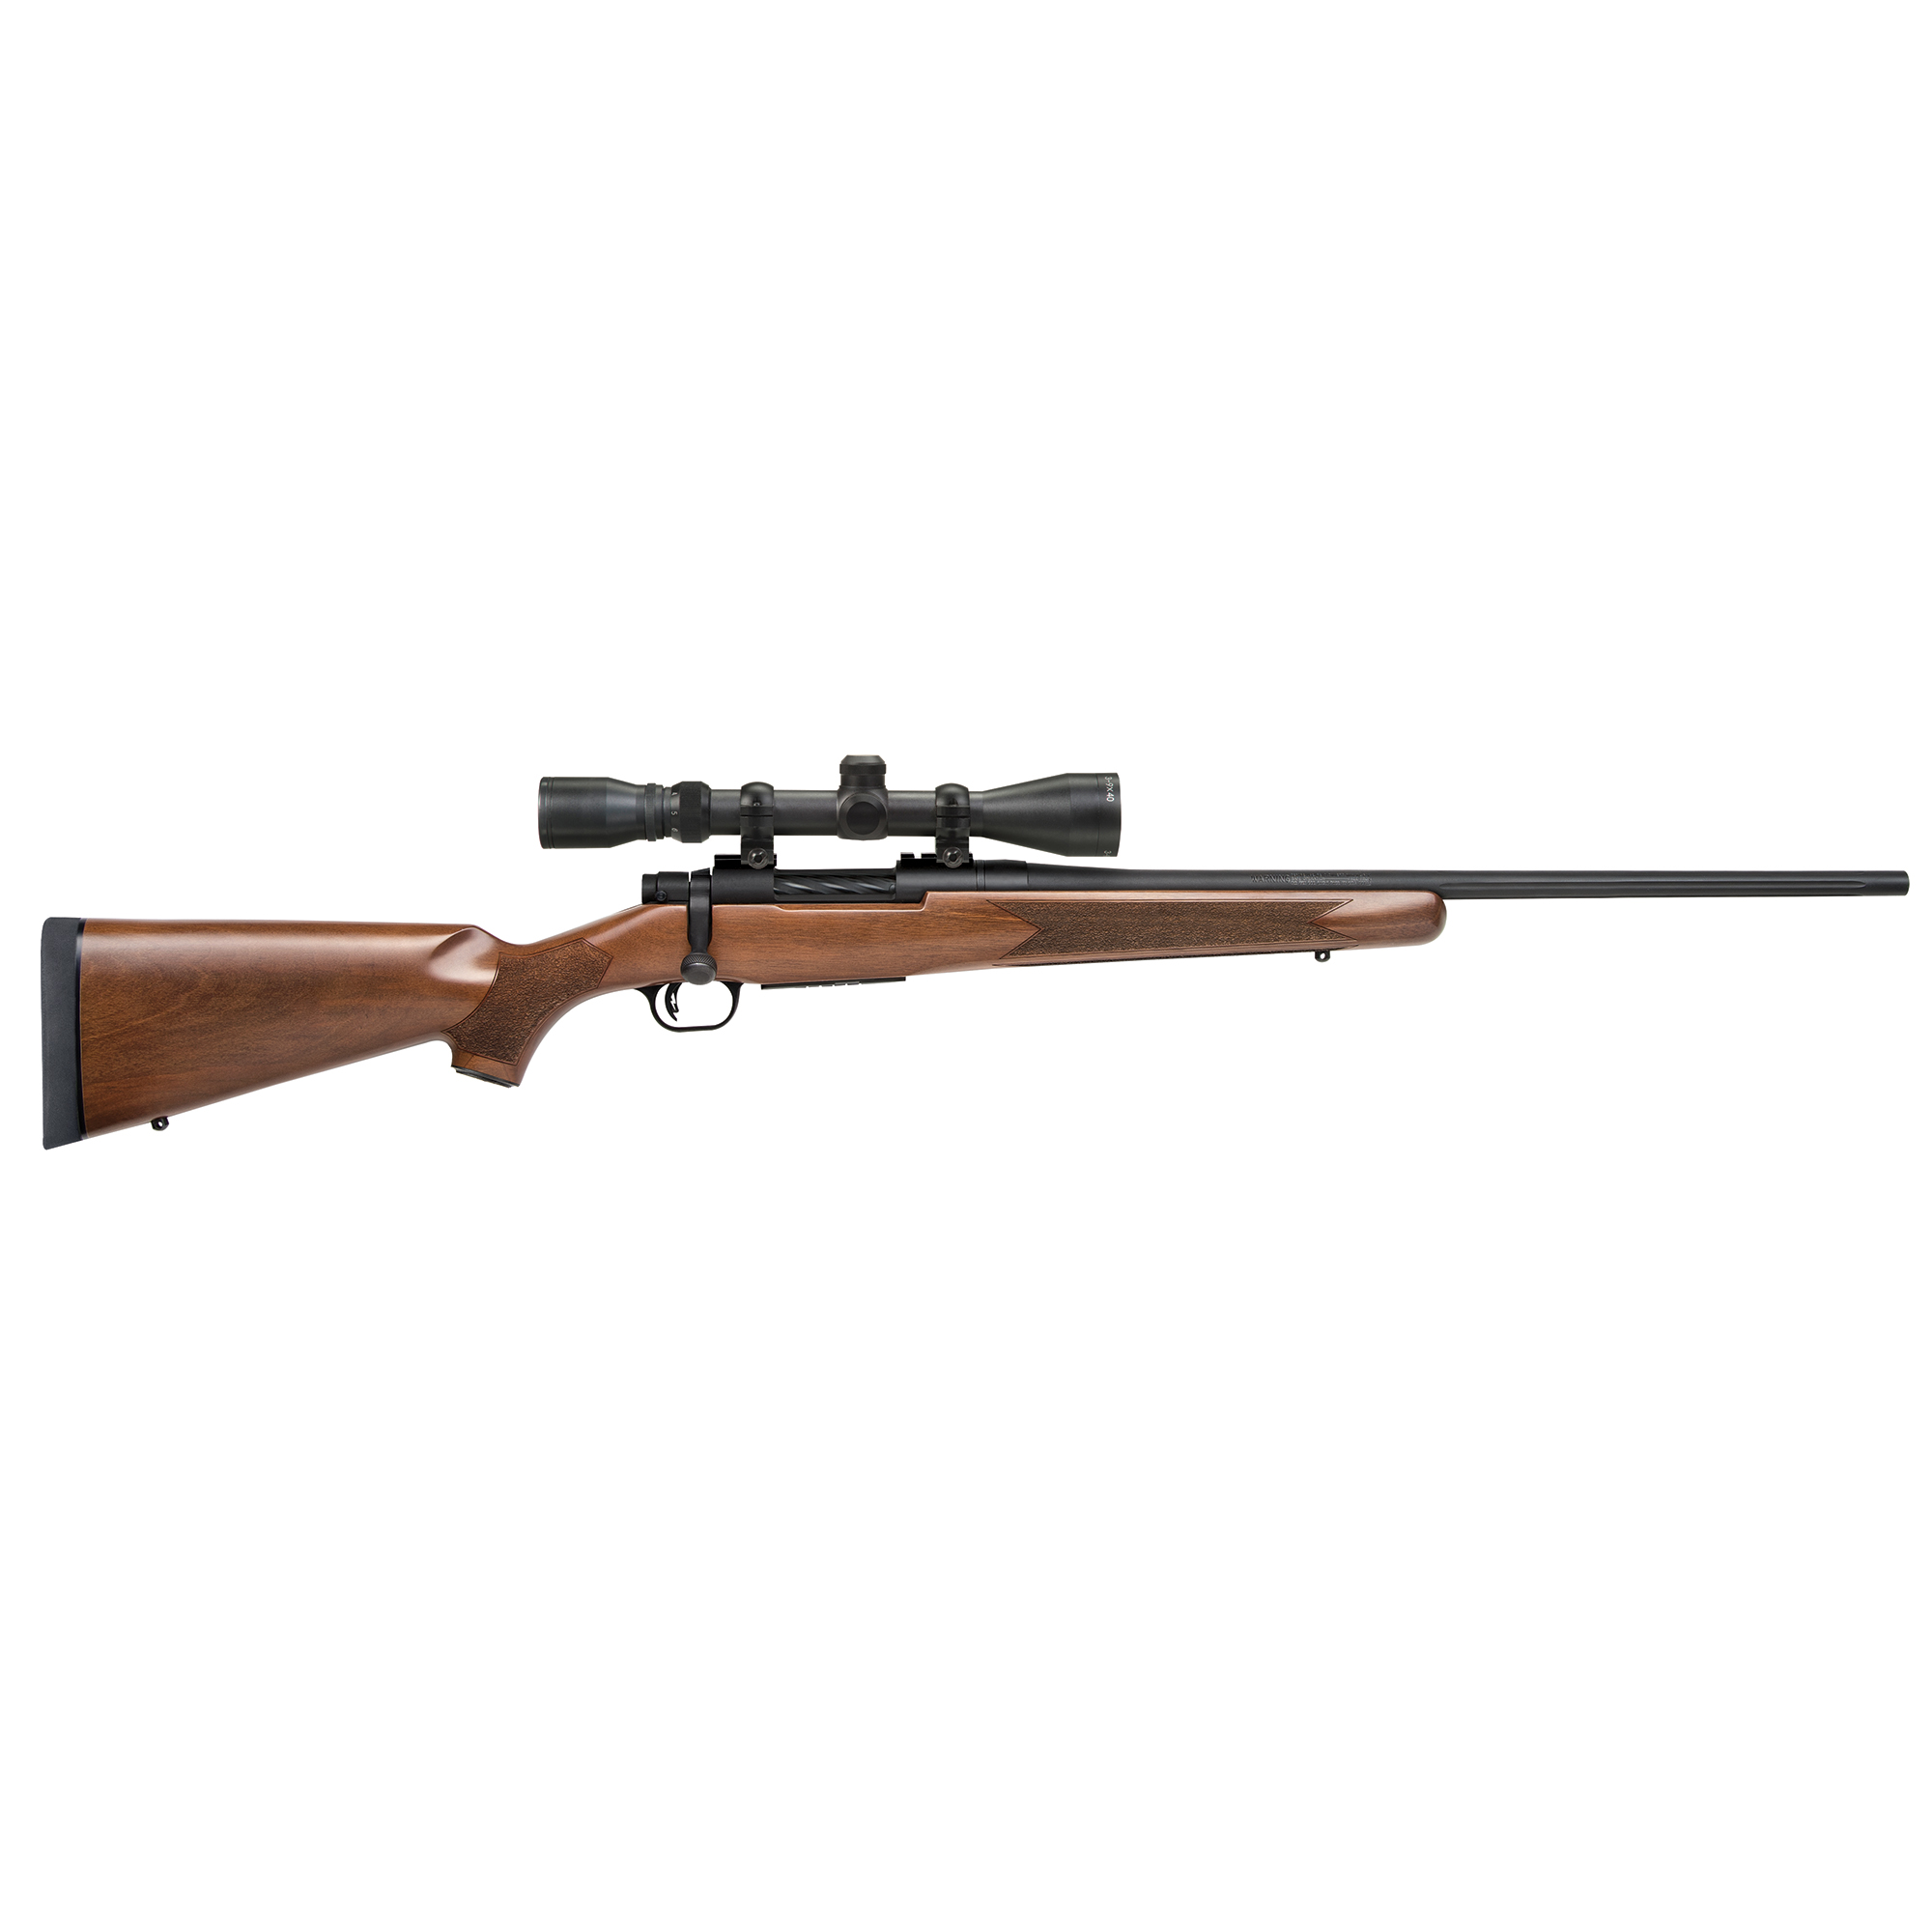 Mossberg Patriot Walnut Centerfire Rifle Package, .308 Win., Walnut